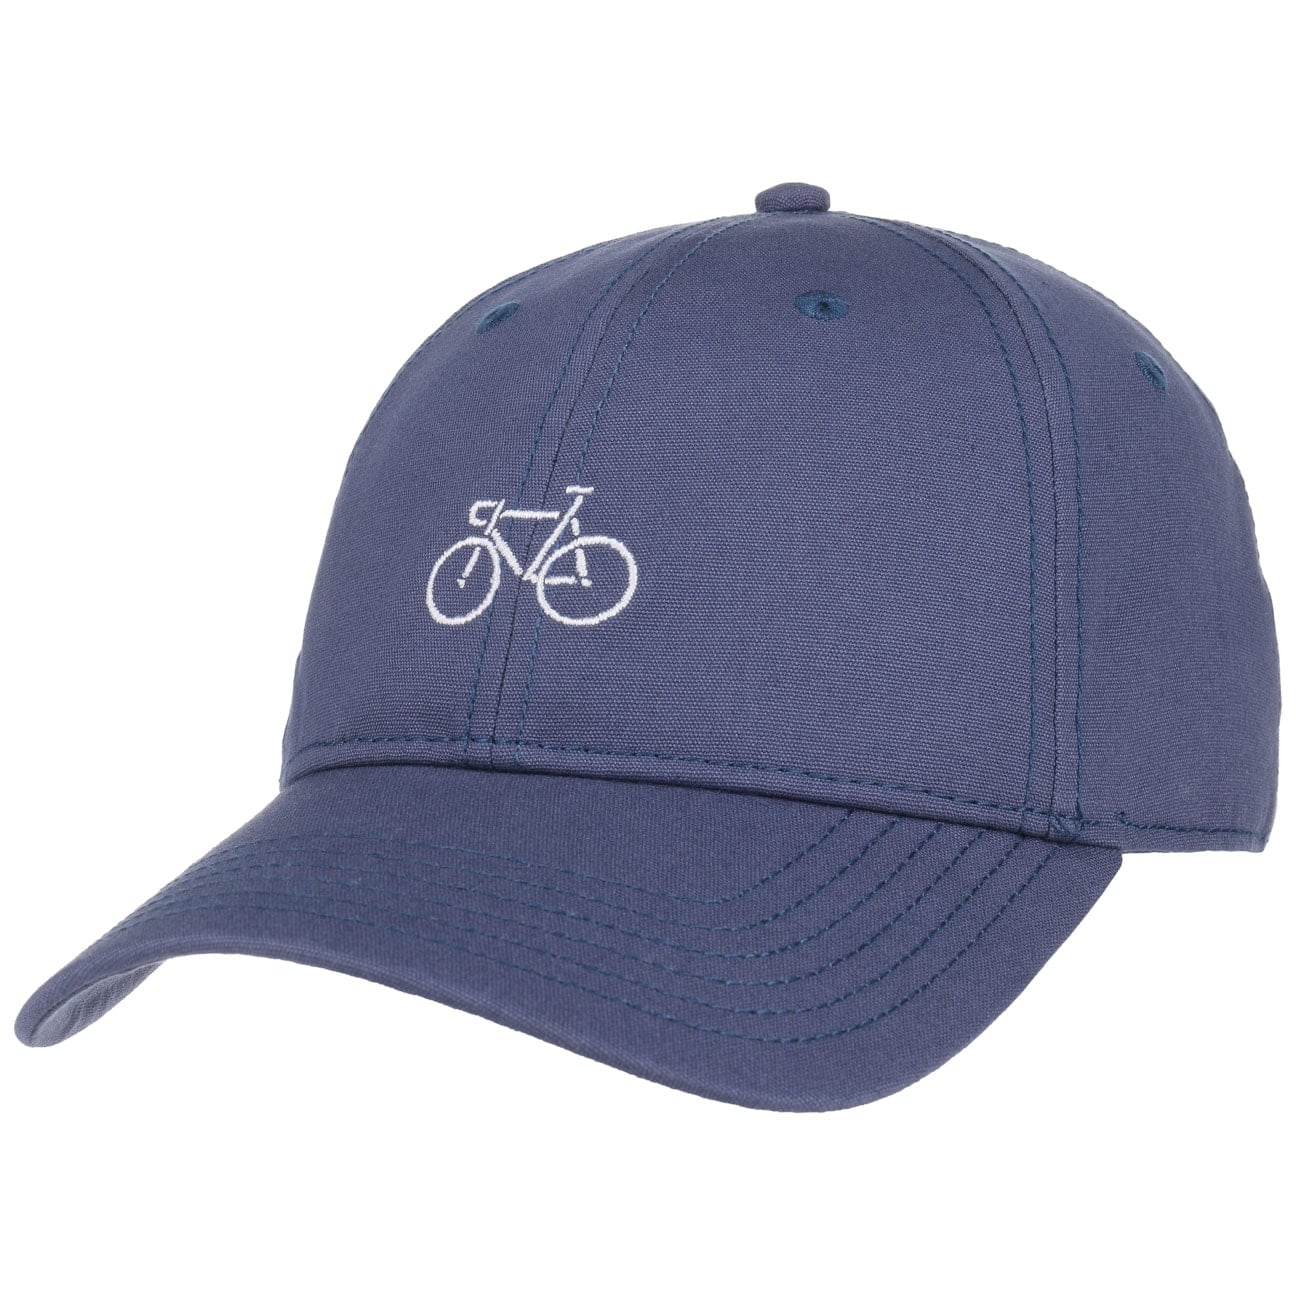 Casquette Picto Bike by dedicated  casquette en coton